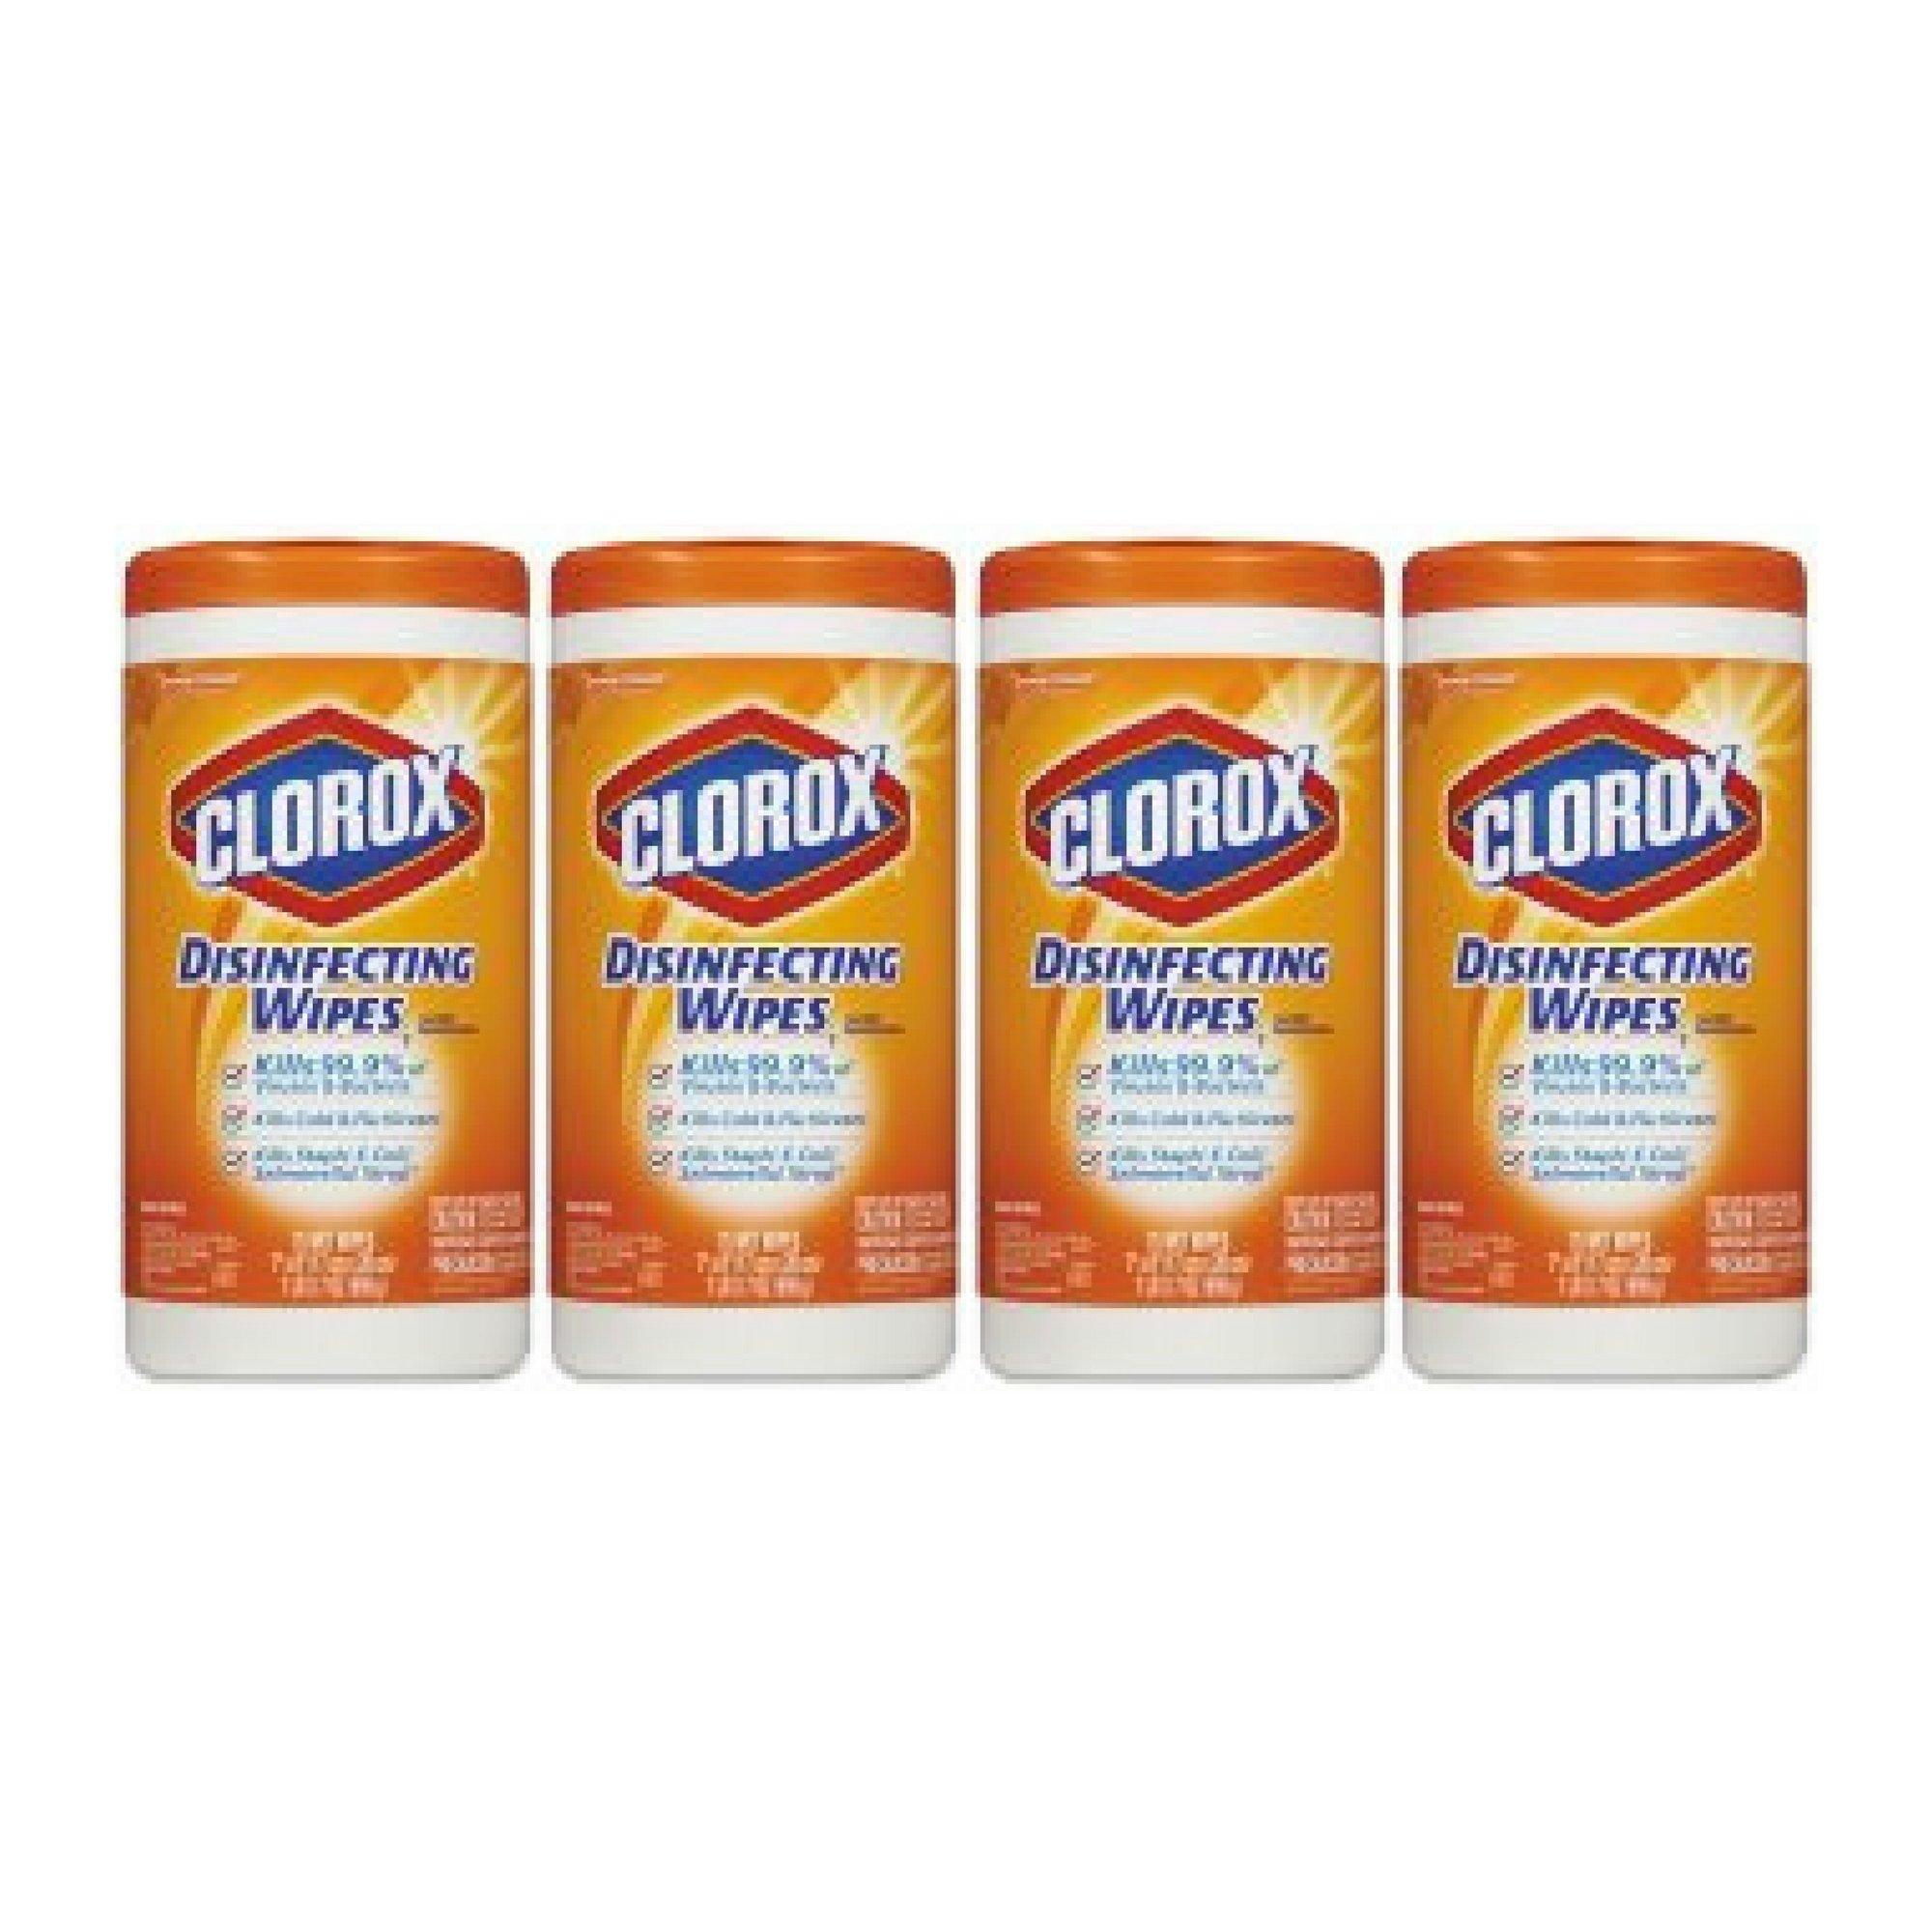 Clorox Disinfecting Wipes, Orange Fusion, 75 Wet Wipes - 4 Packs